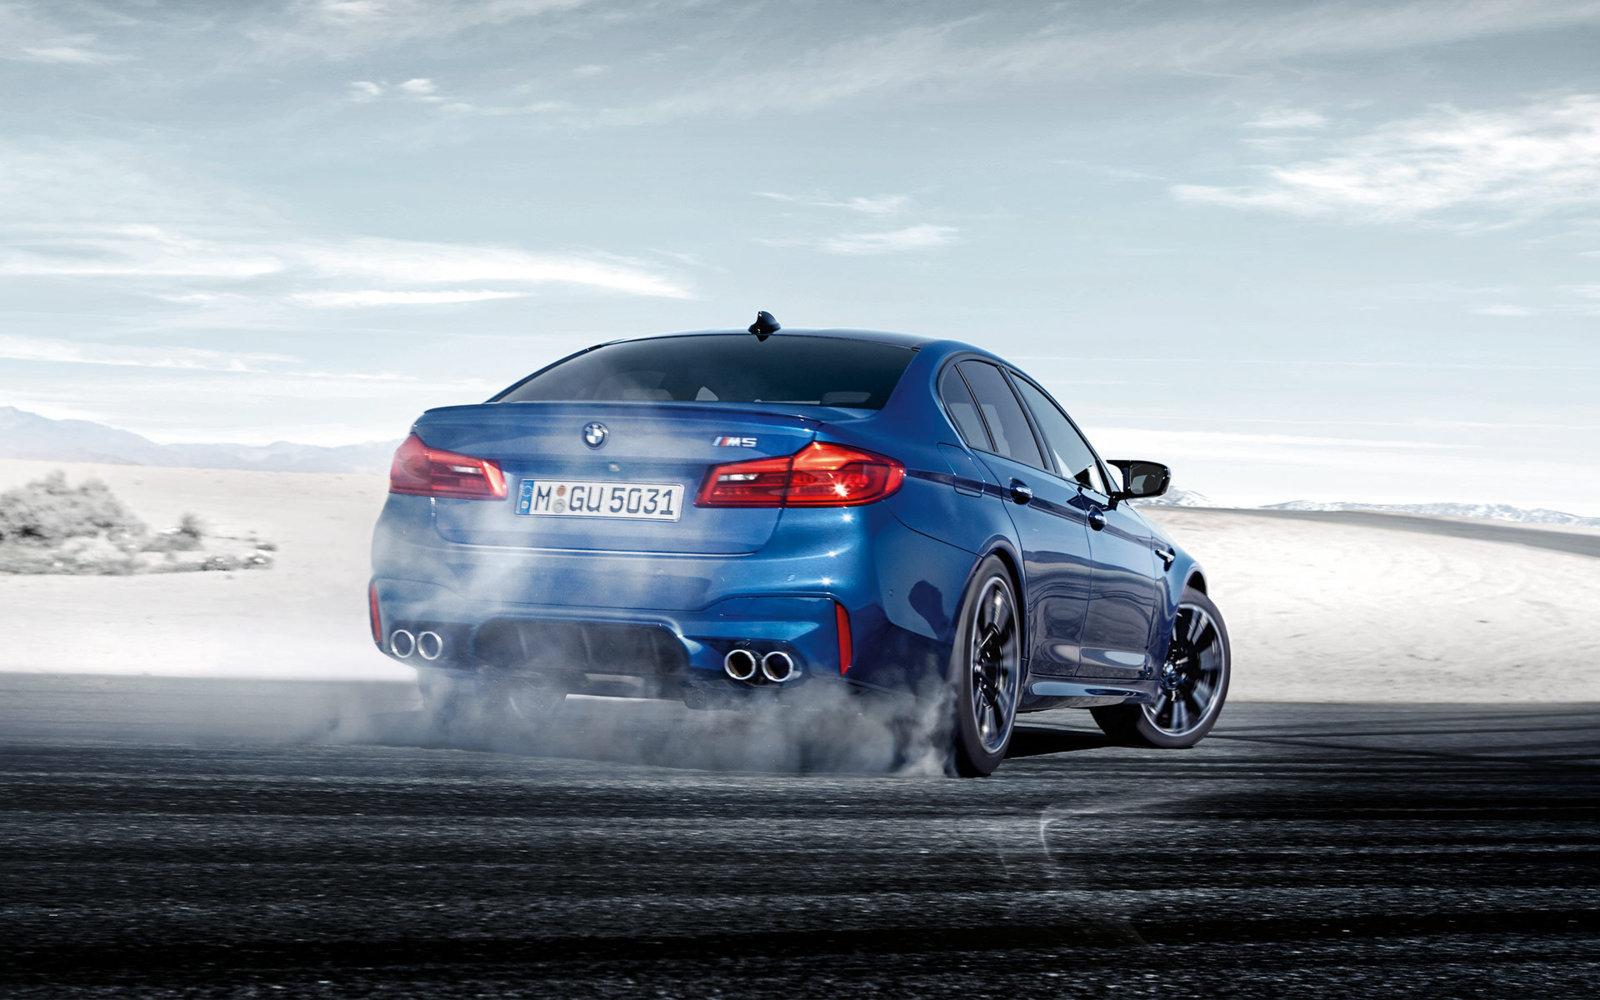 BMW-M5-2018-Wallpaper-6.jpg